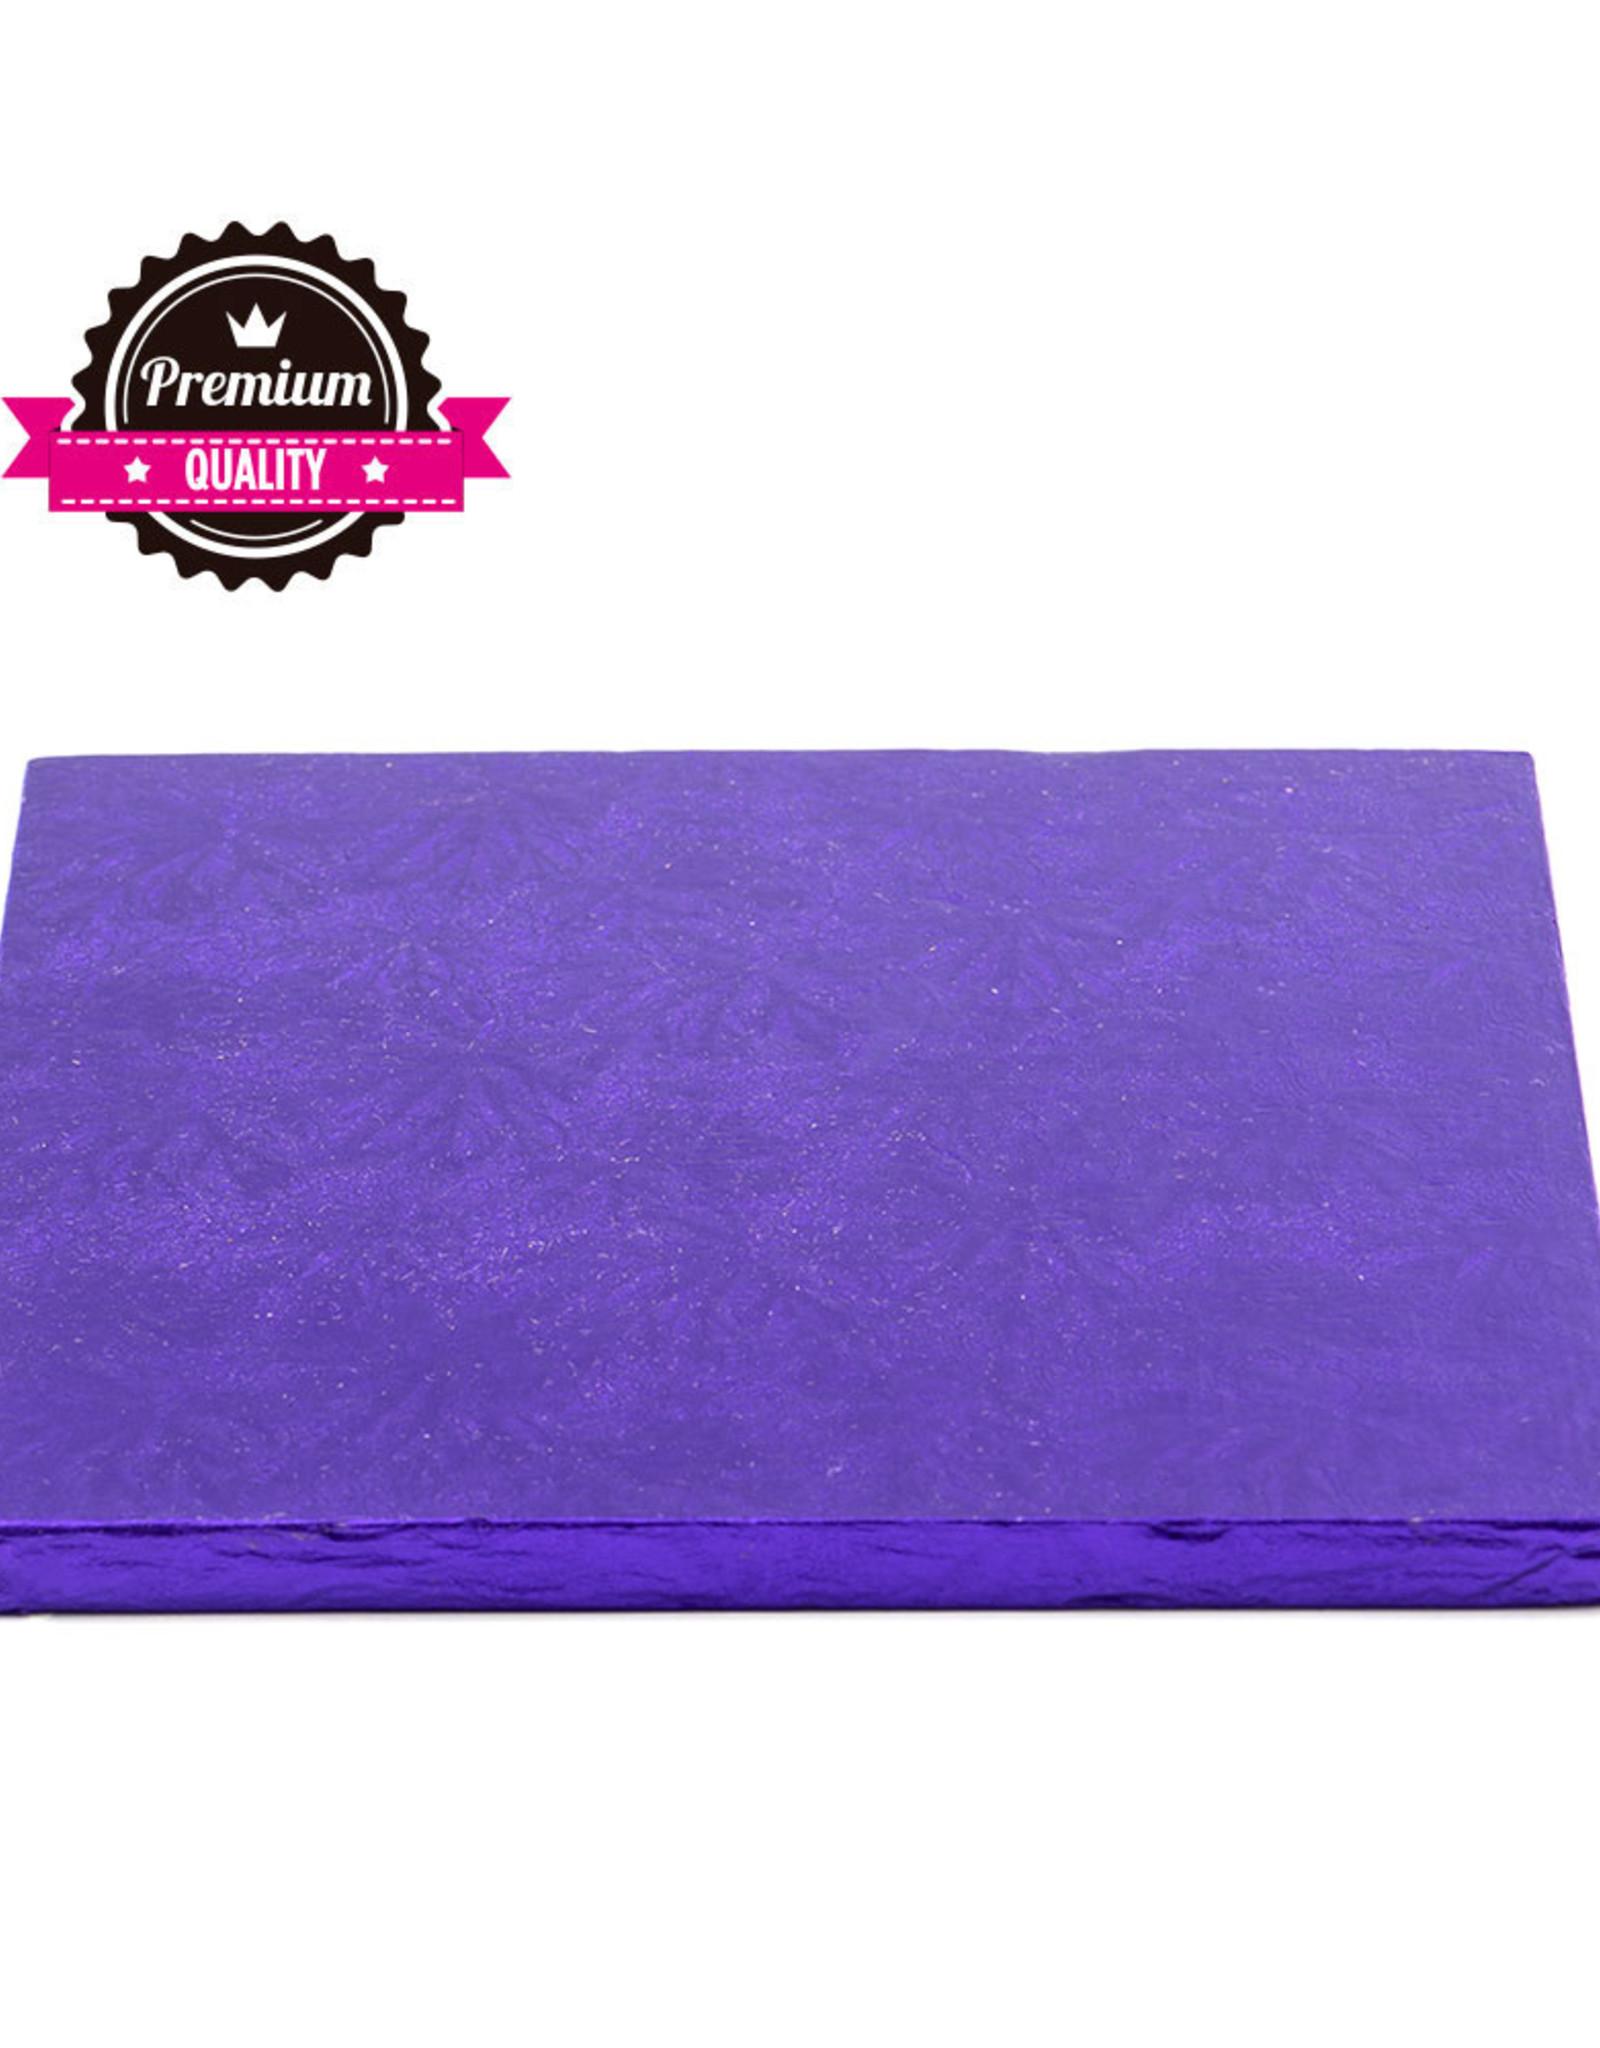 Cake Drum Vierkant 25cm Violet